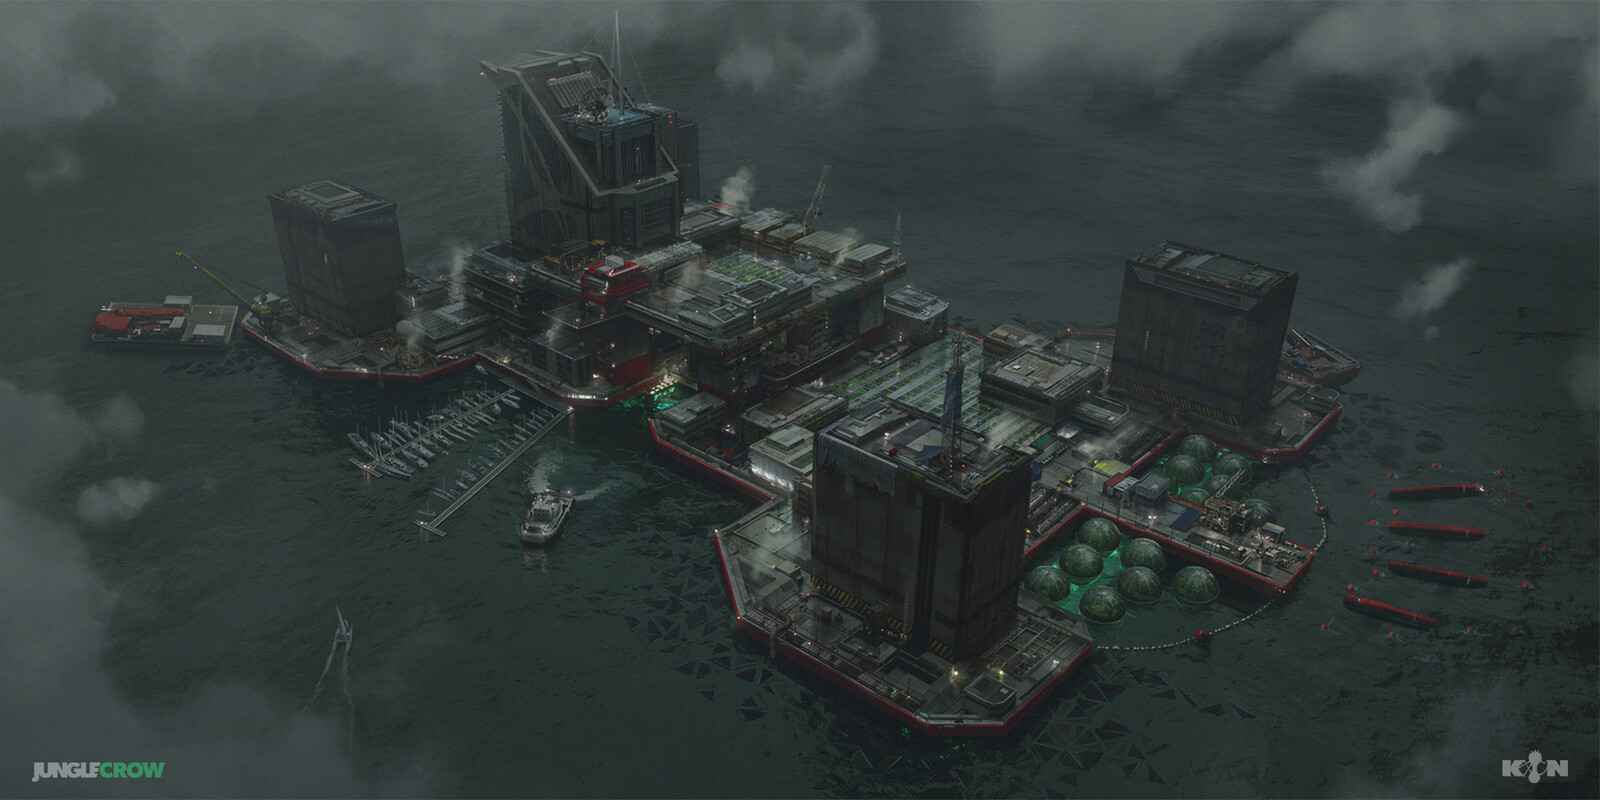 KキIンN - The Raft